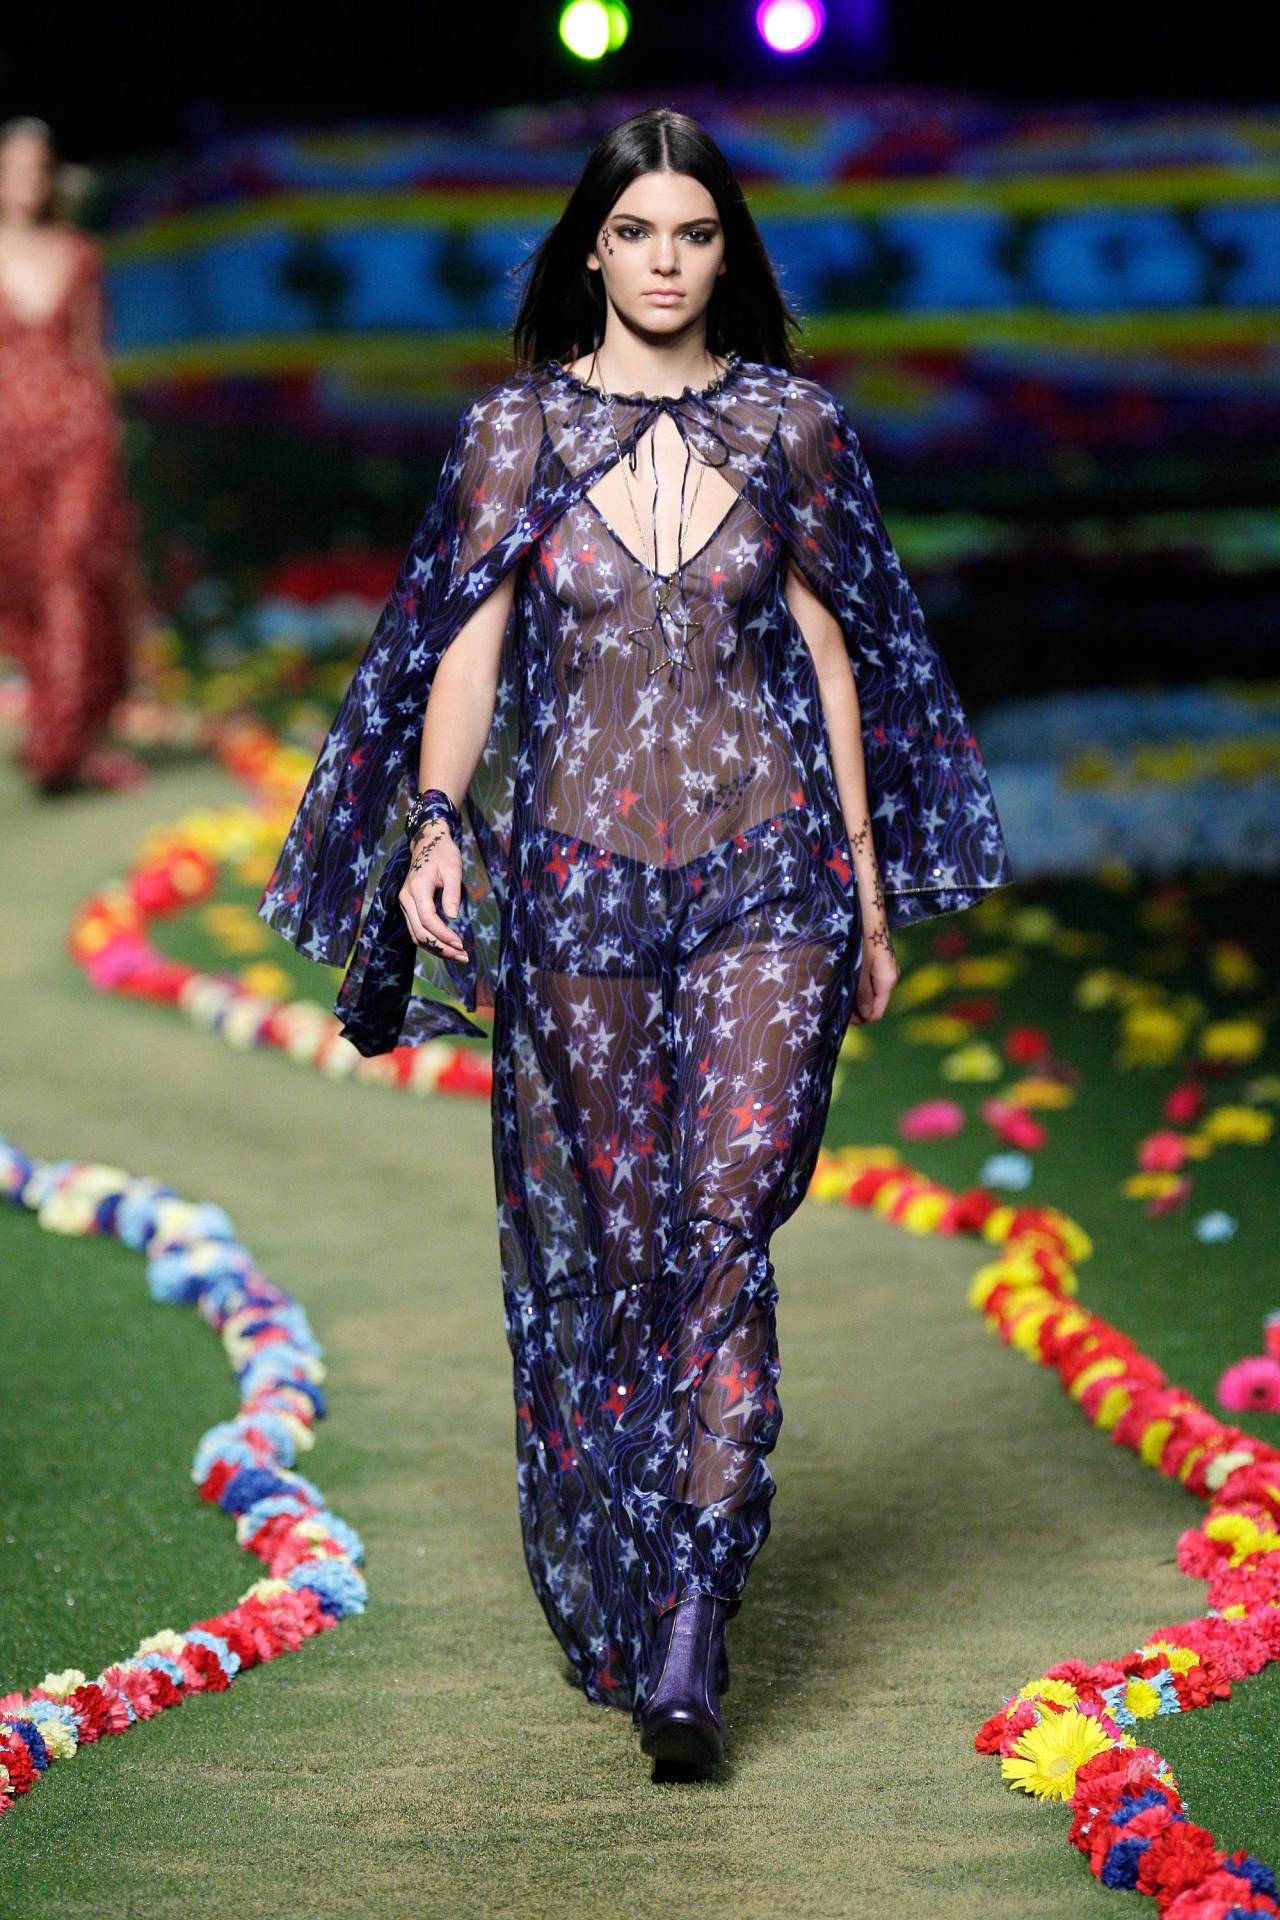 Runway Dress Tommy Hilfiger Nrm Kendall Jenner Tommy Hilfiger Nyfw